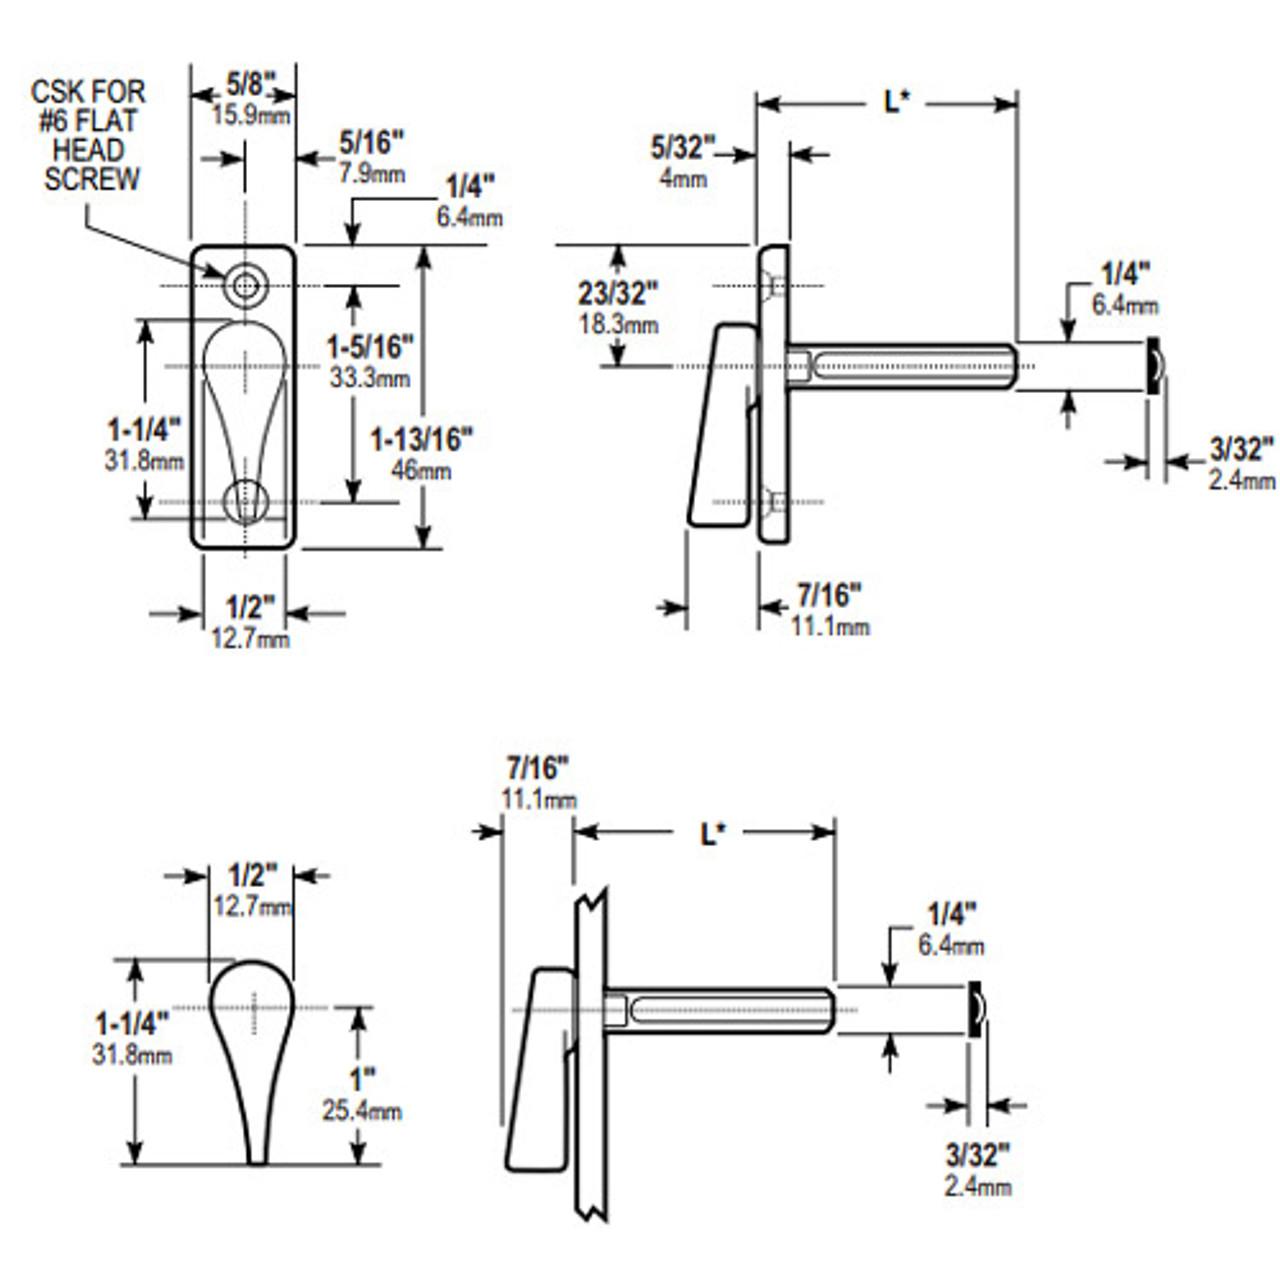 1000-02-21-121 Adams Rite 1000 Series Turns Dimensional View